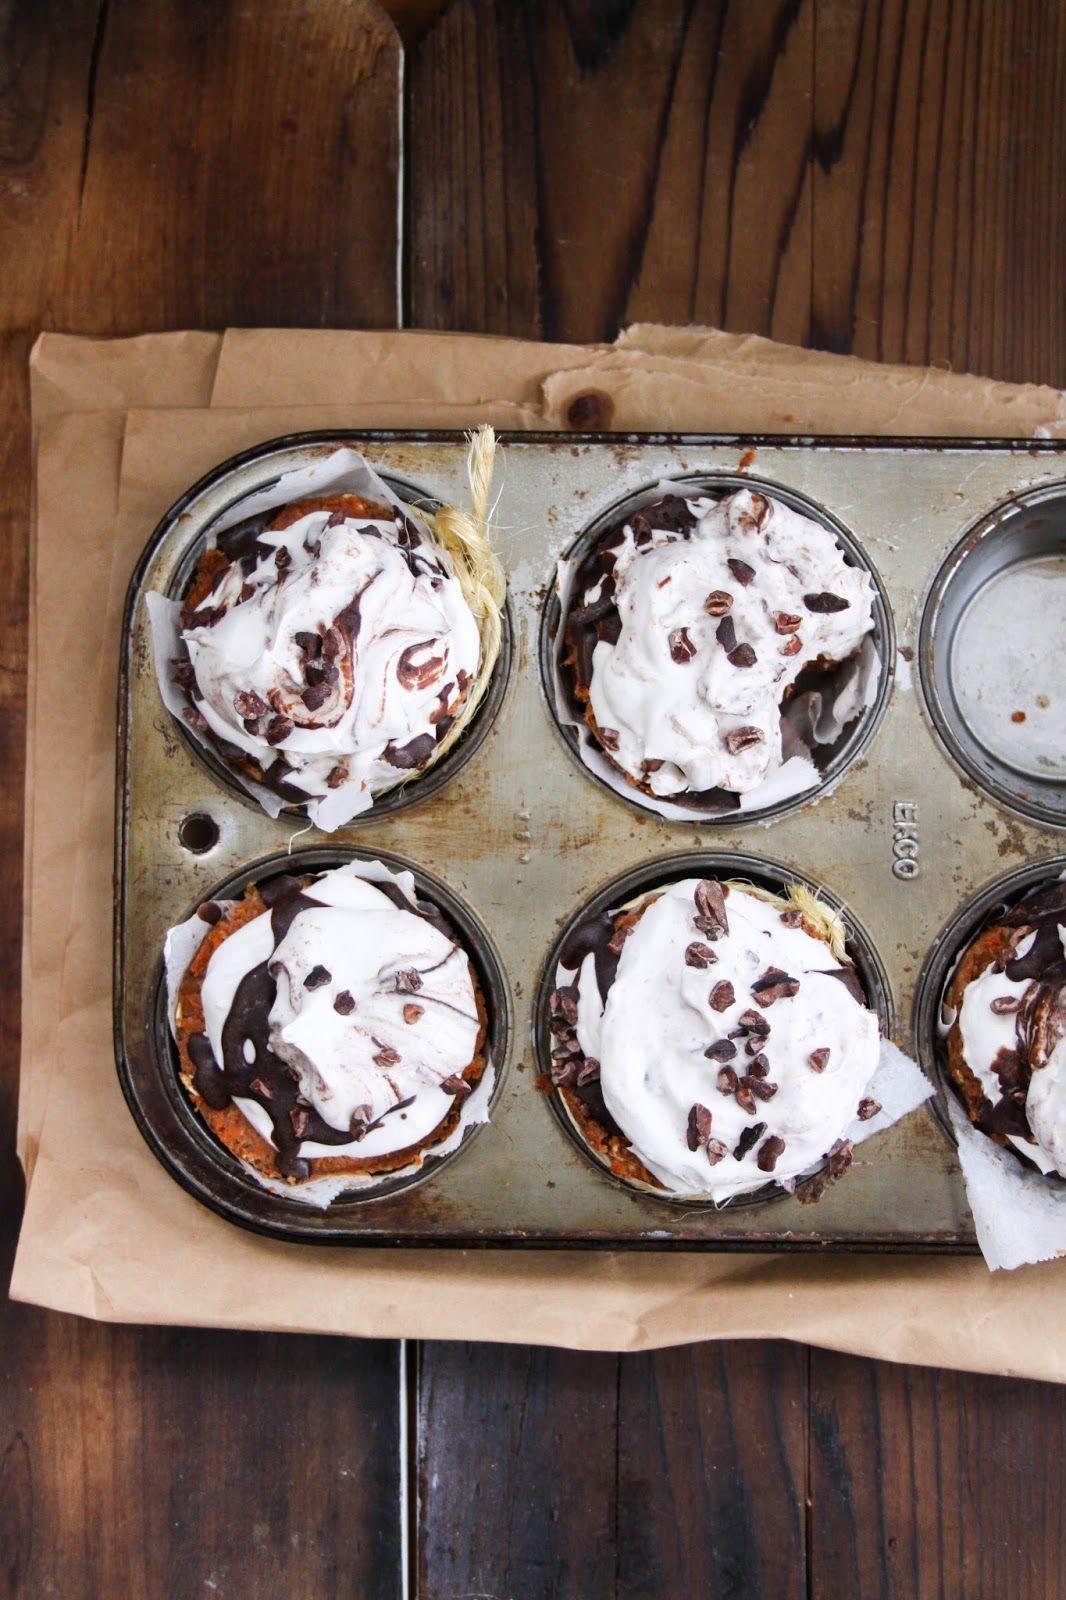 This Rawsome Vegan Life: CARROT CAKE CUPCAKES with WHIPPED COCONUT CREAM + CHOCOLATE